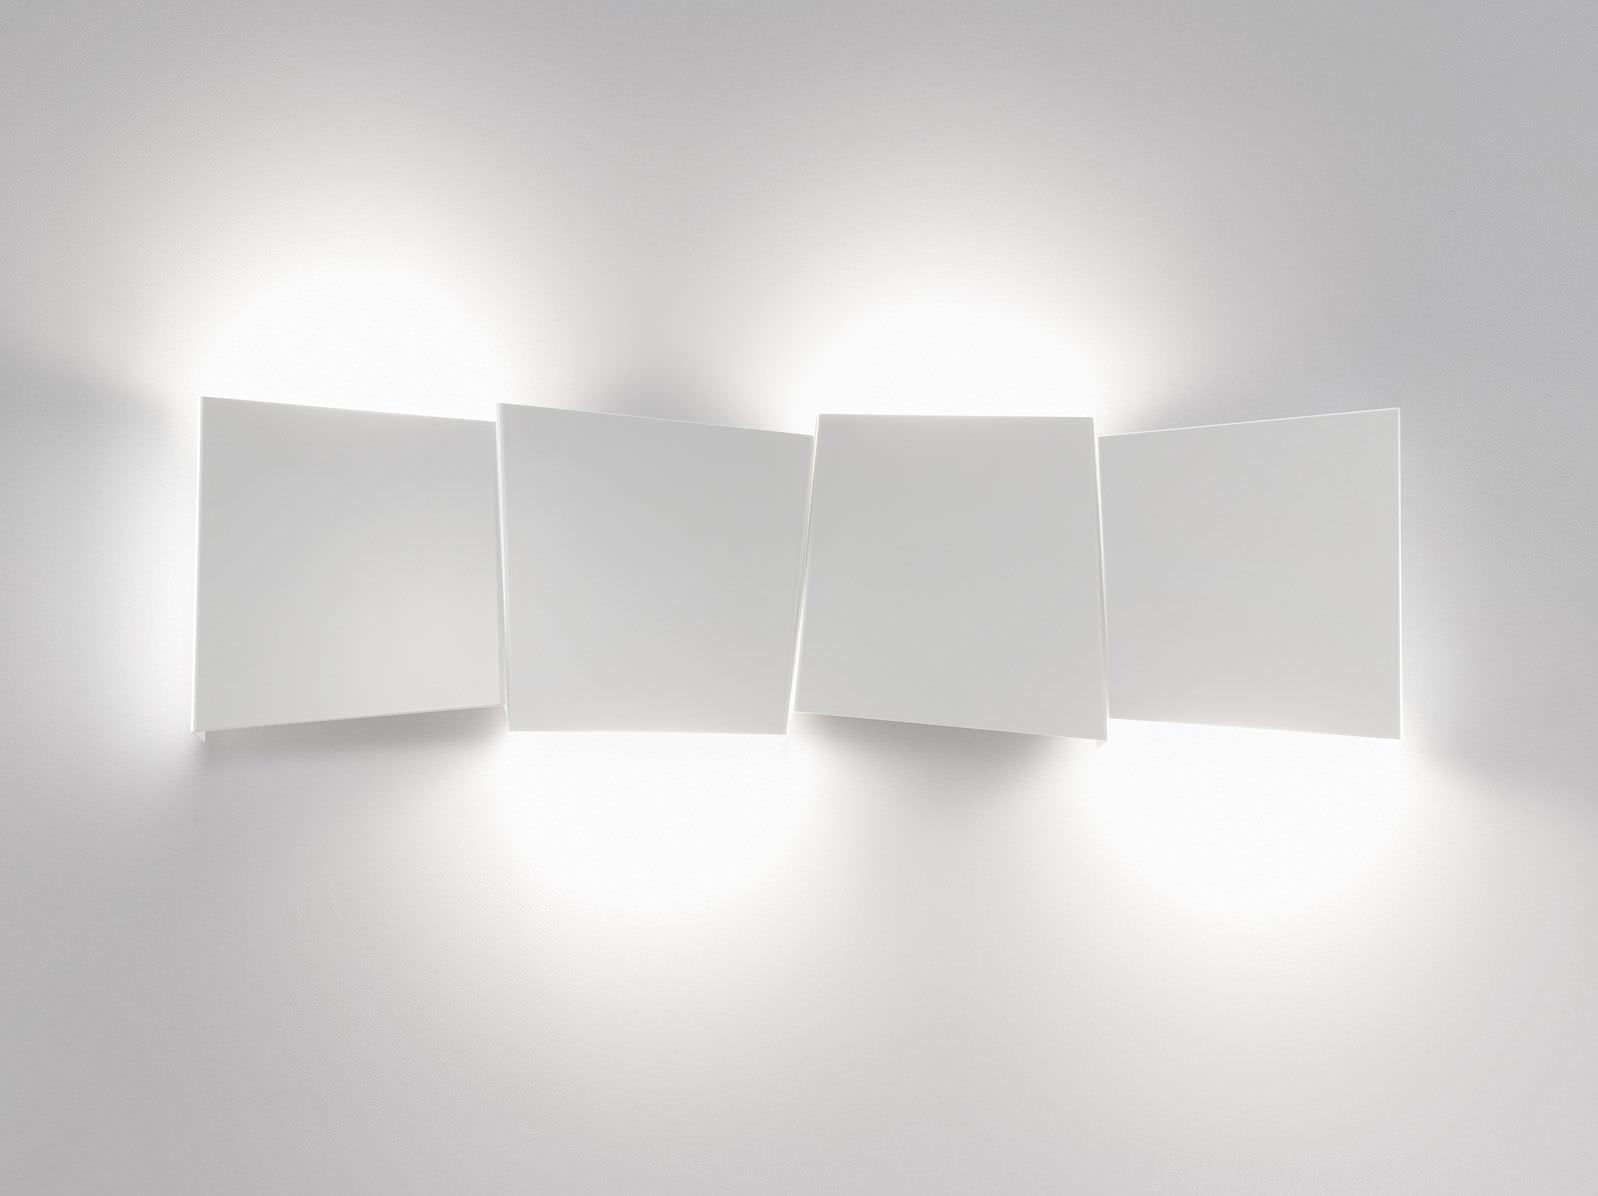 Lampade Da Parete Design: Applique lampada da parete design ...